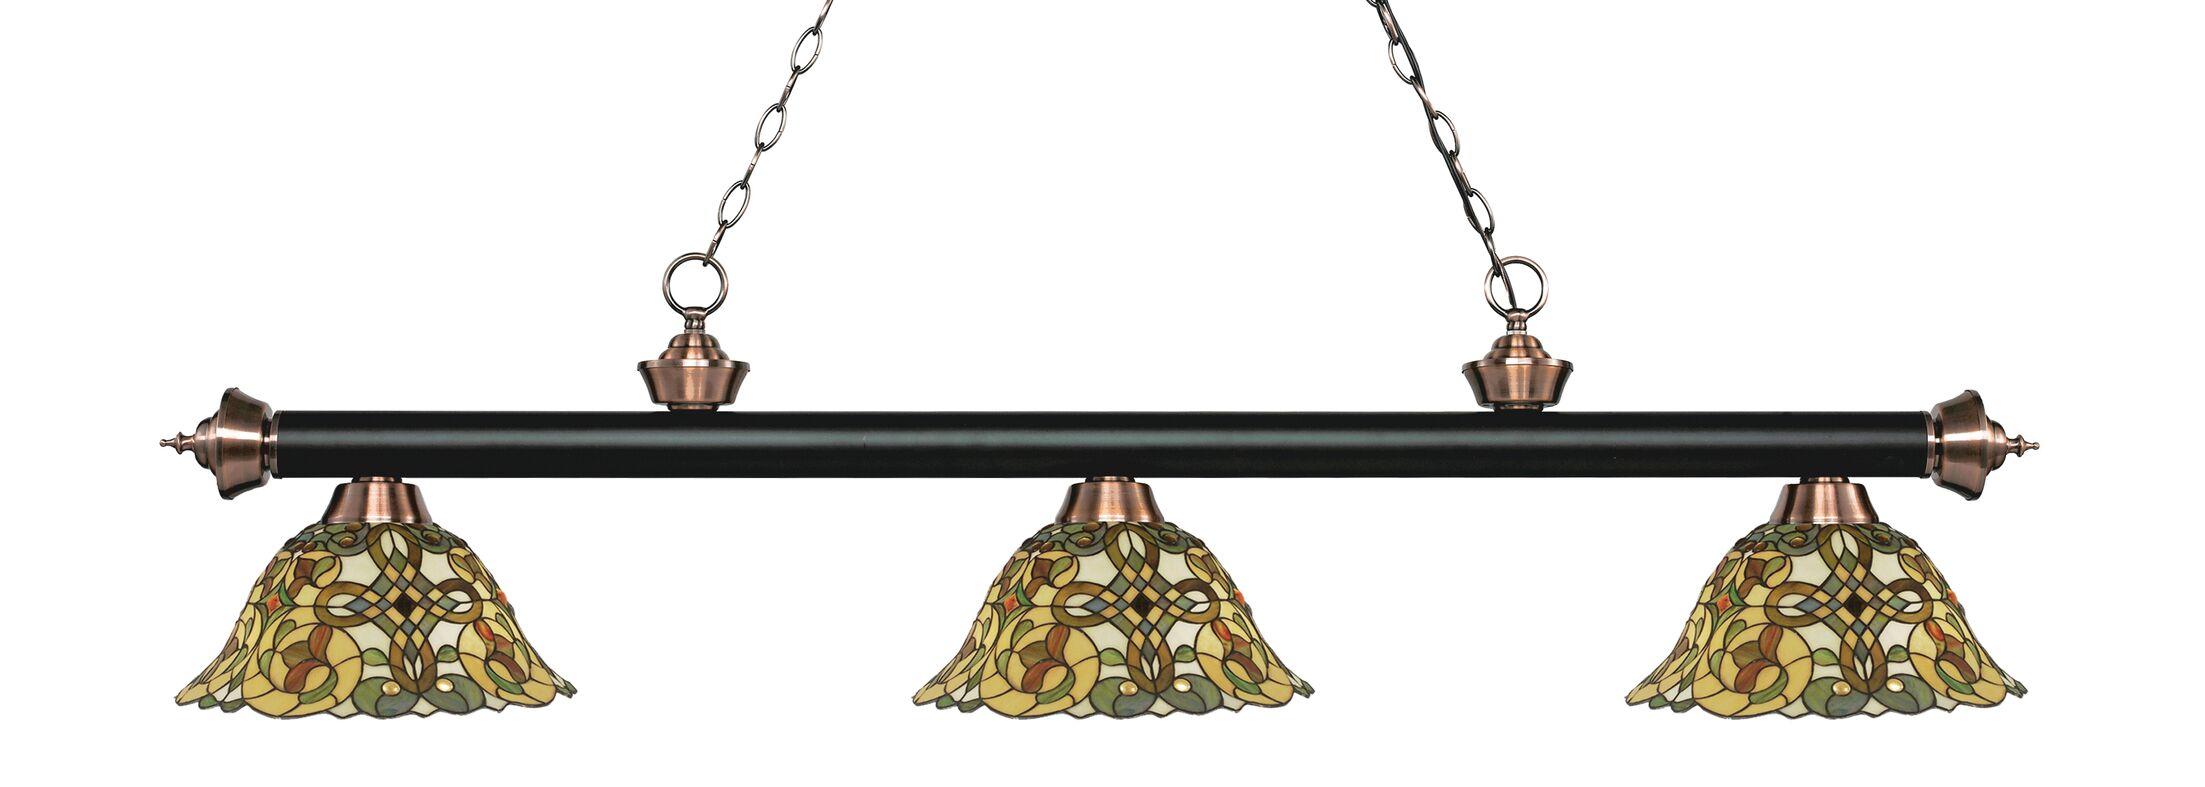 Billington 3-Light Billiard Light Color: Matte Black / Antique Copper